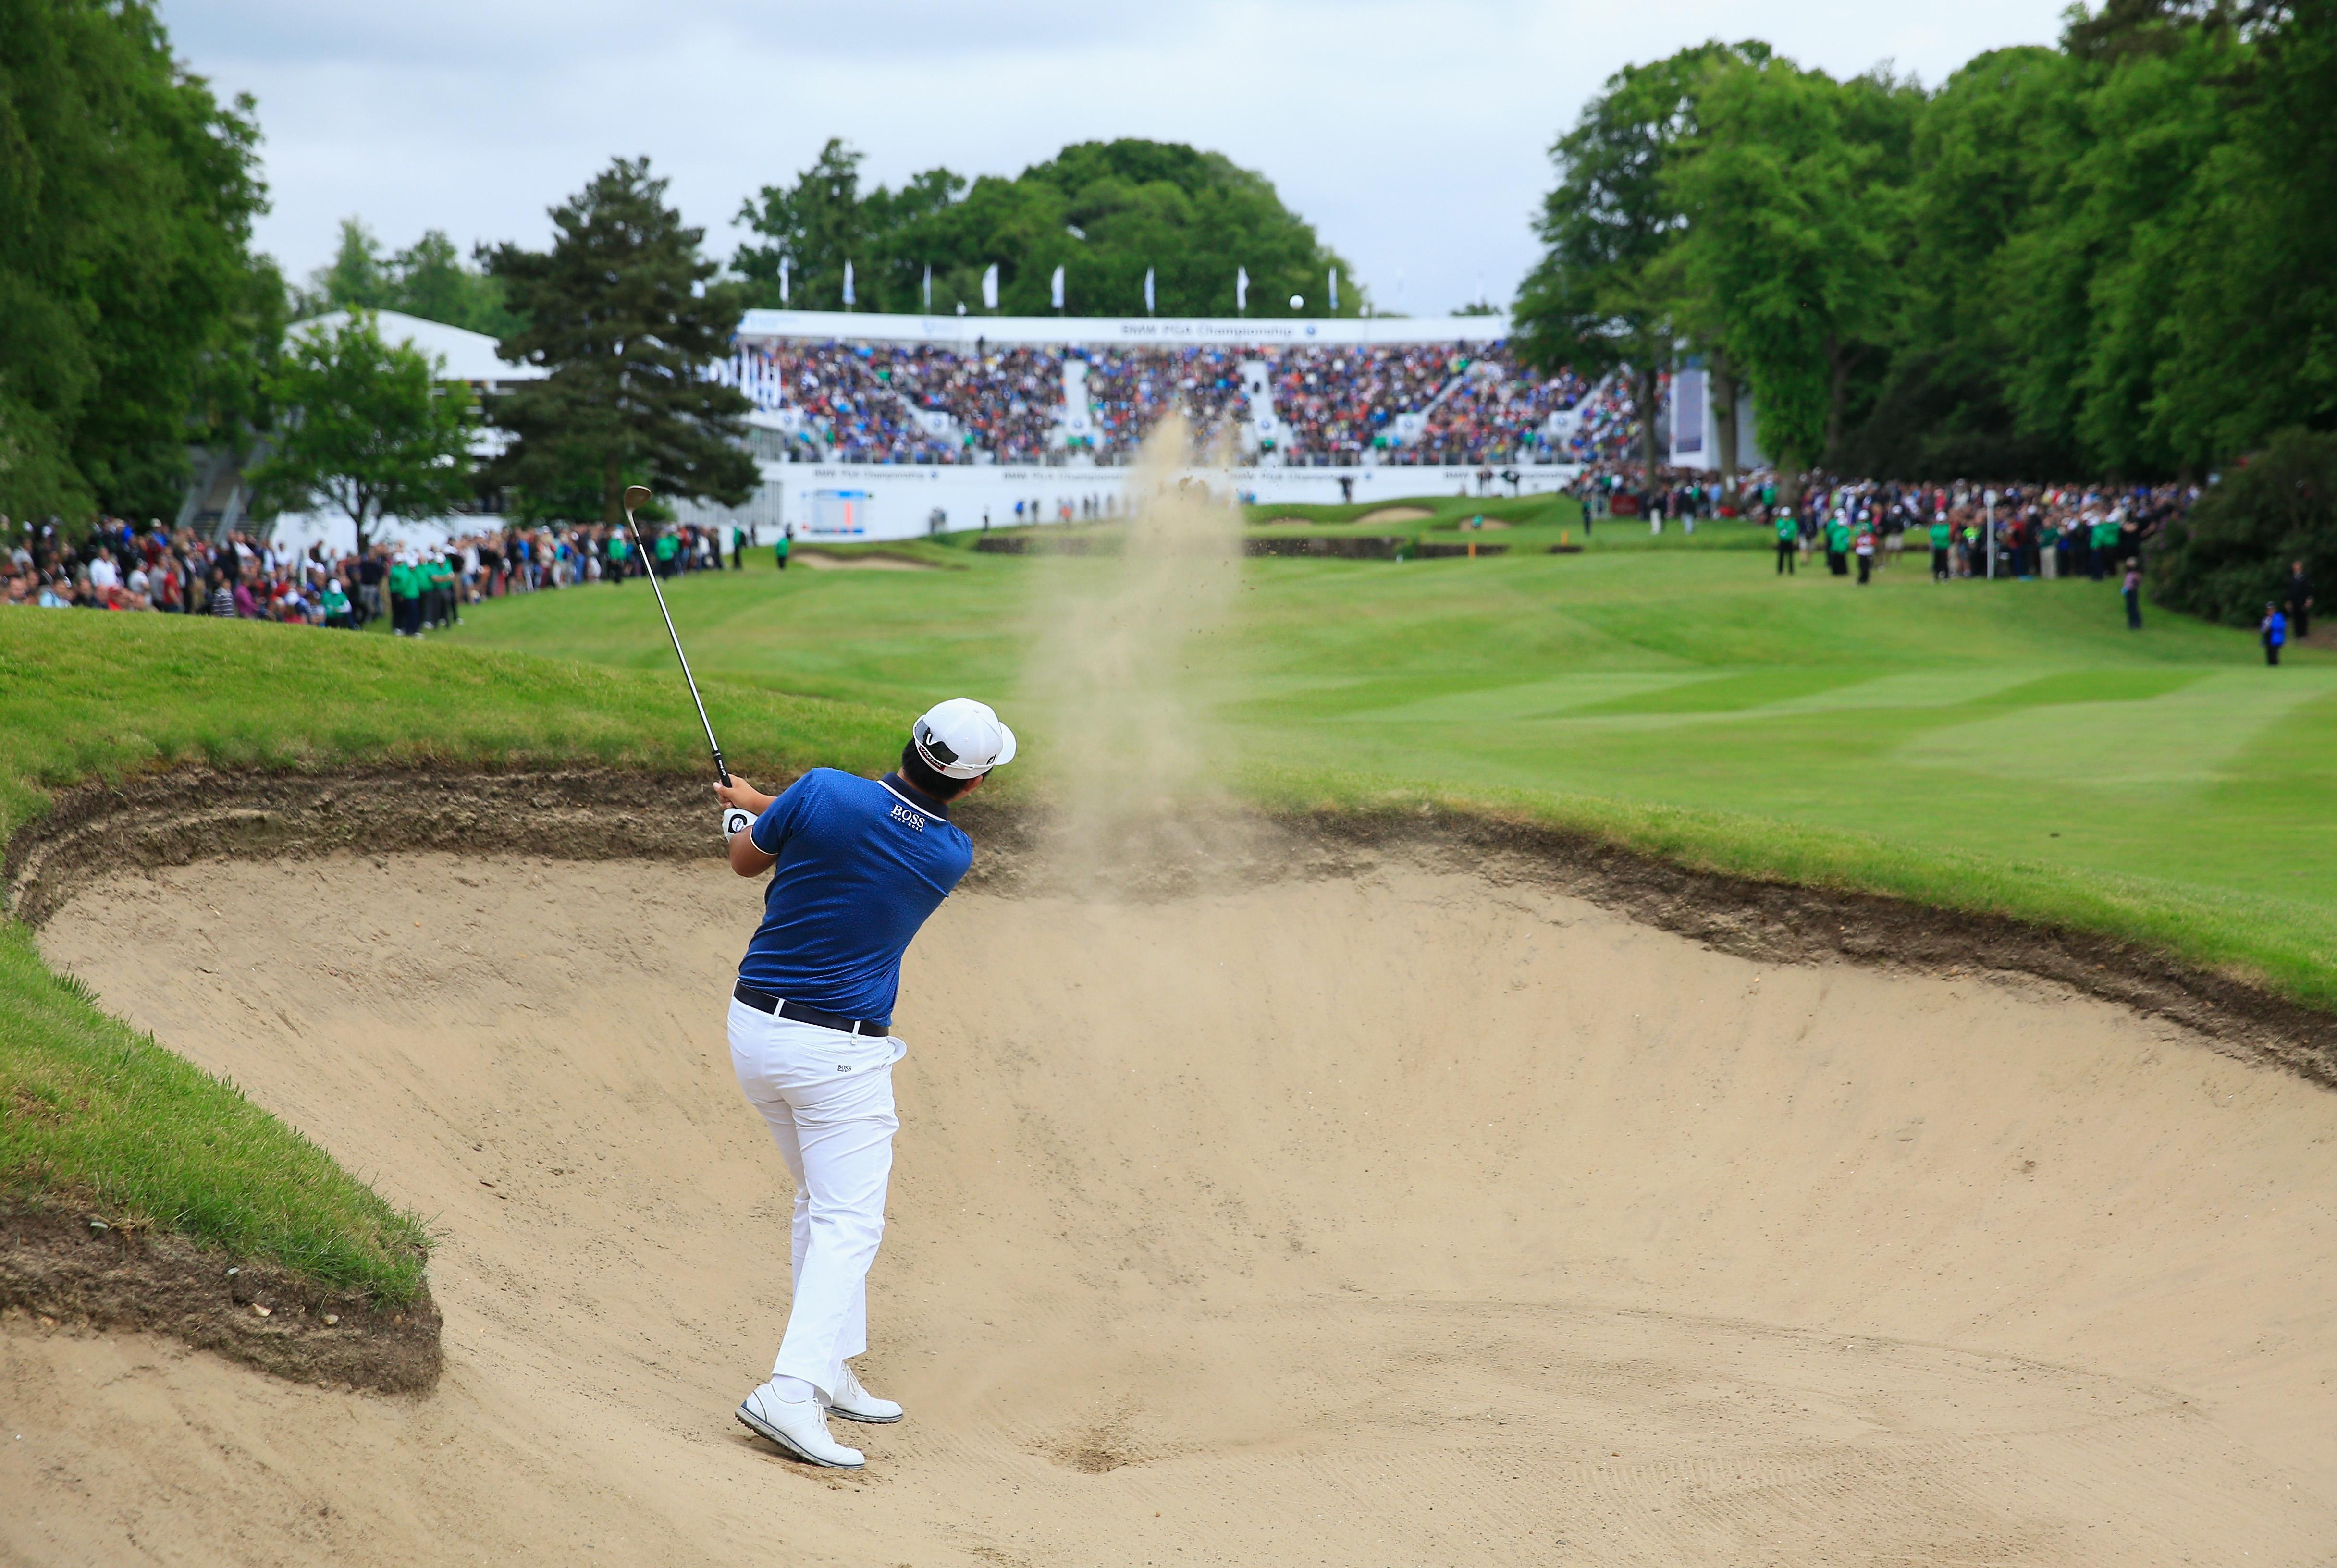 South Korea's Byeong-Hun An won the BMW PGA Championship by six shots (Photo: Getty Images)